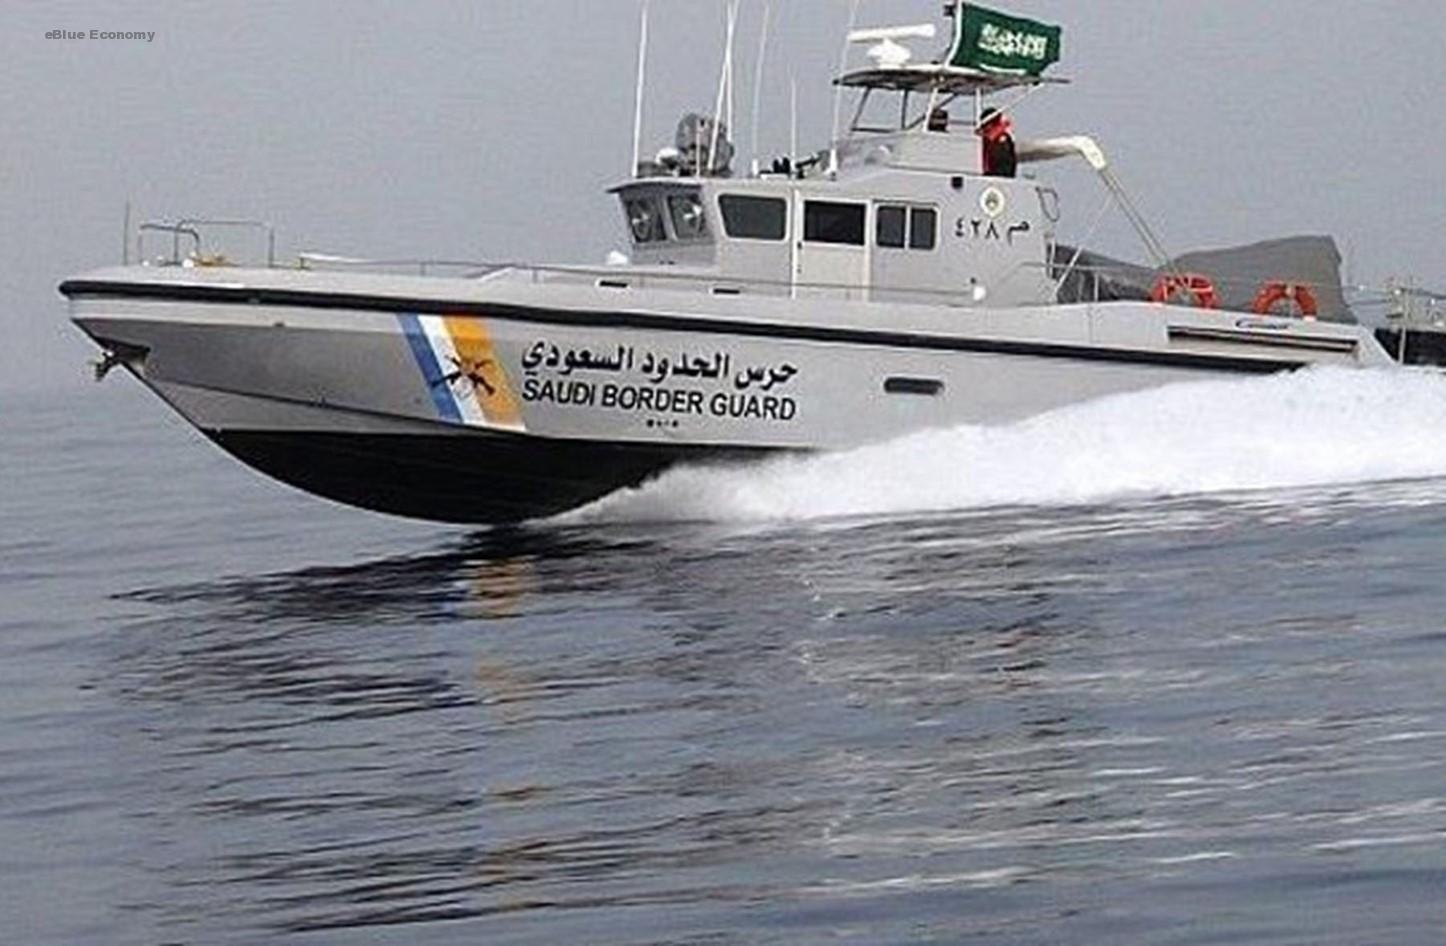 eBlue_economy_البحرية_السعودية